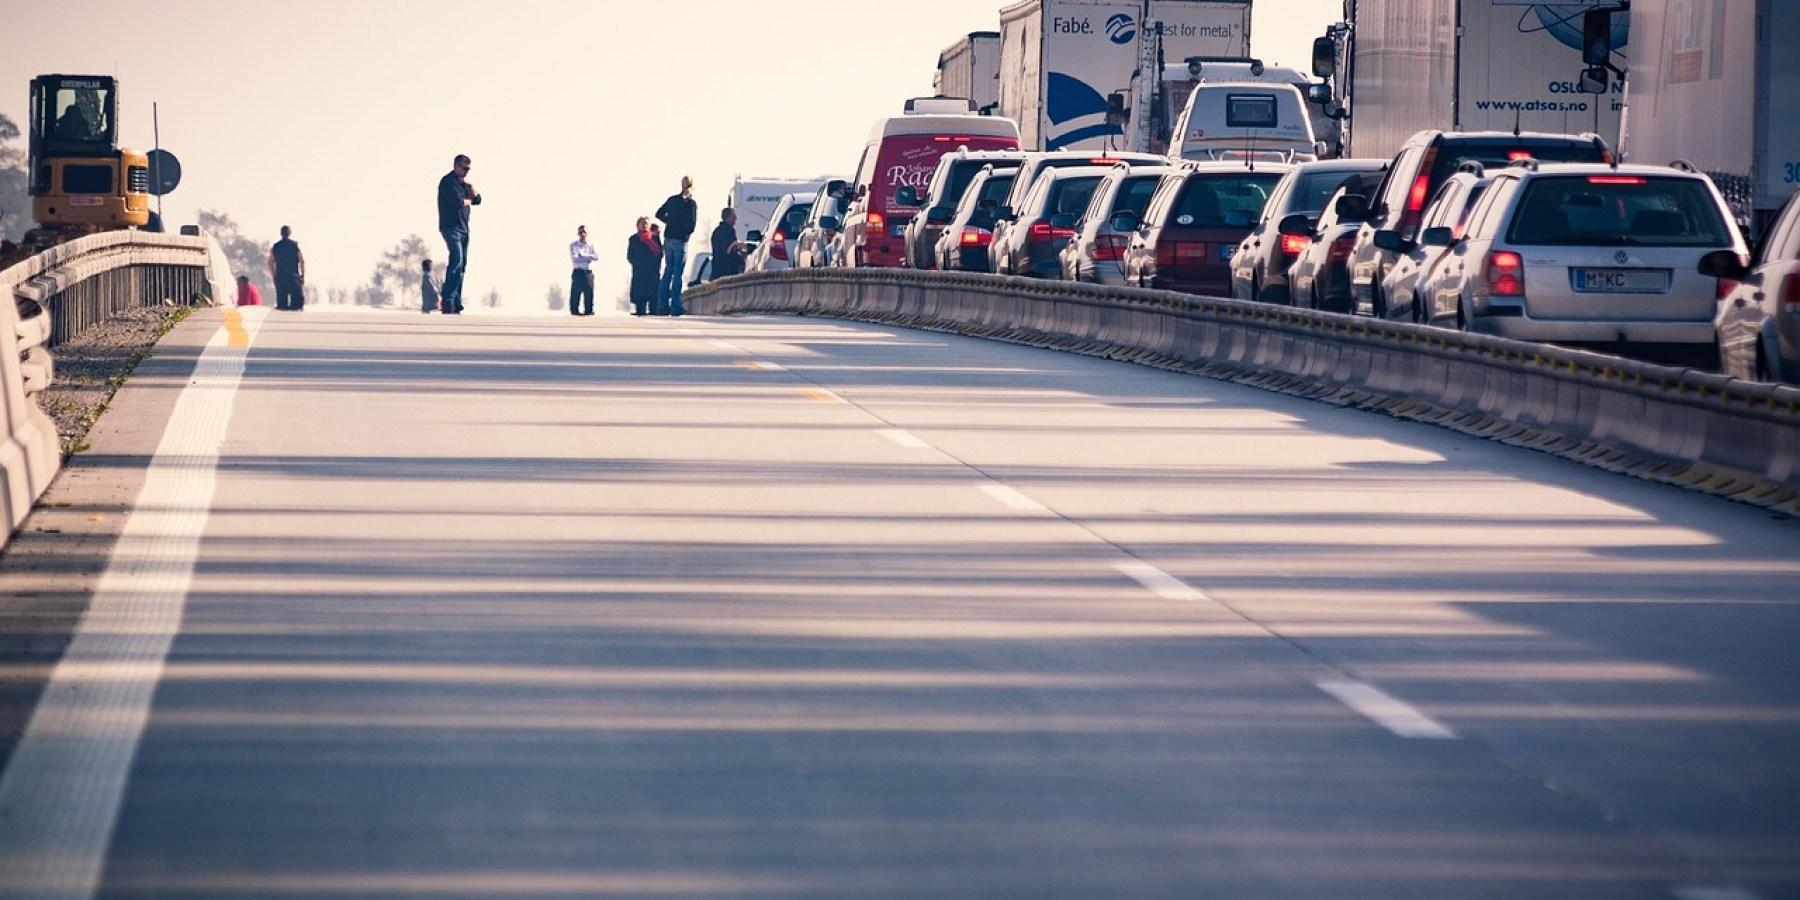 Hochzeits-Korso blockiert Fahrbahn der A43